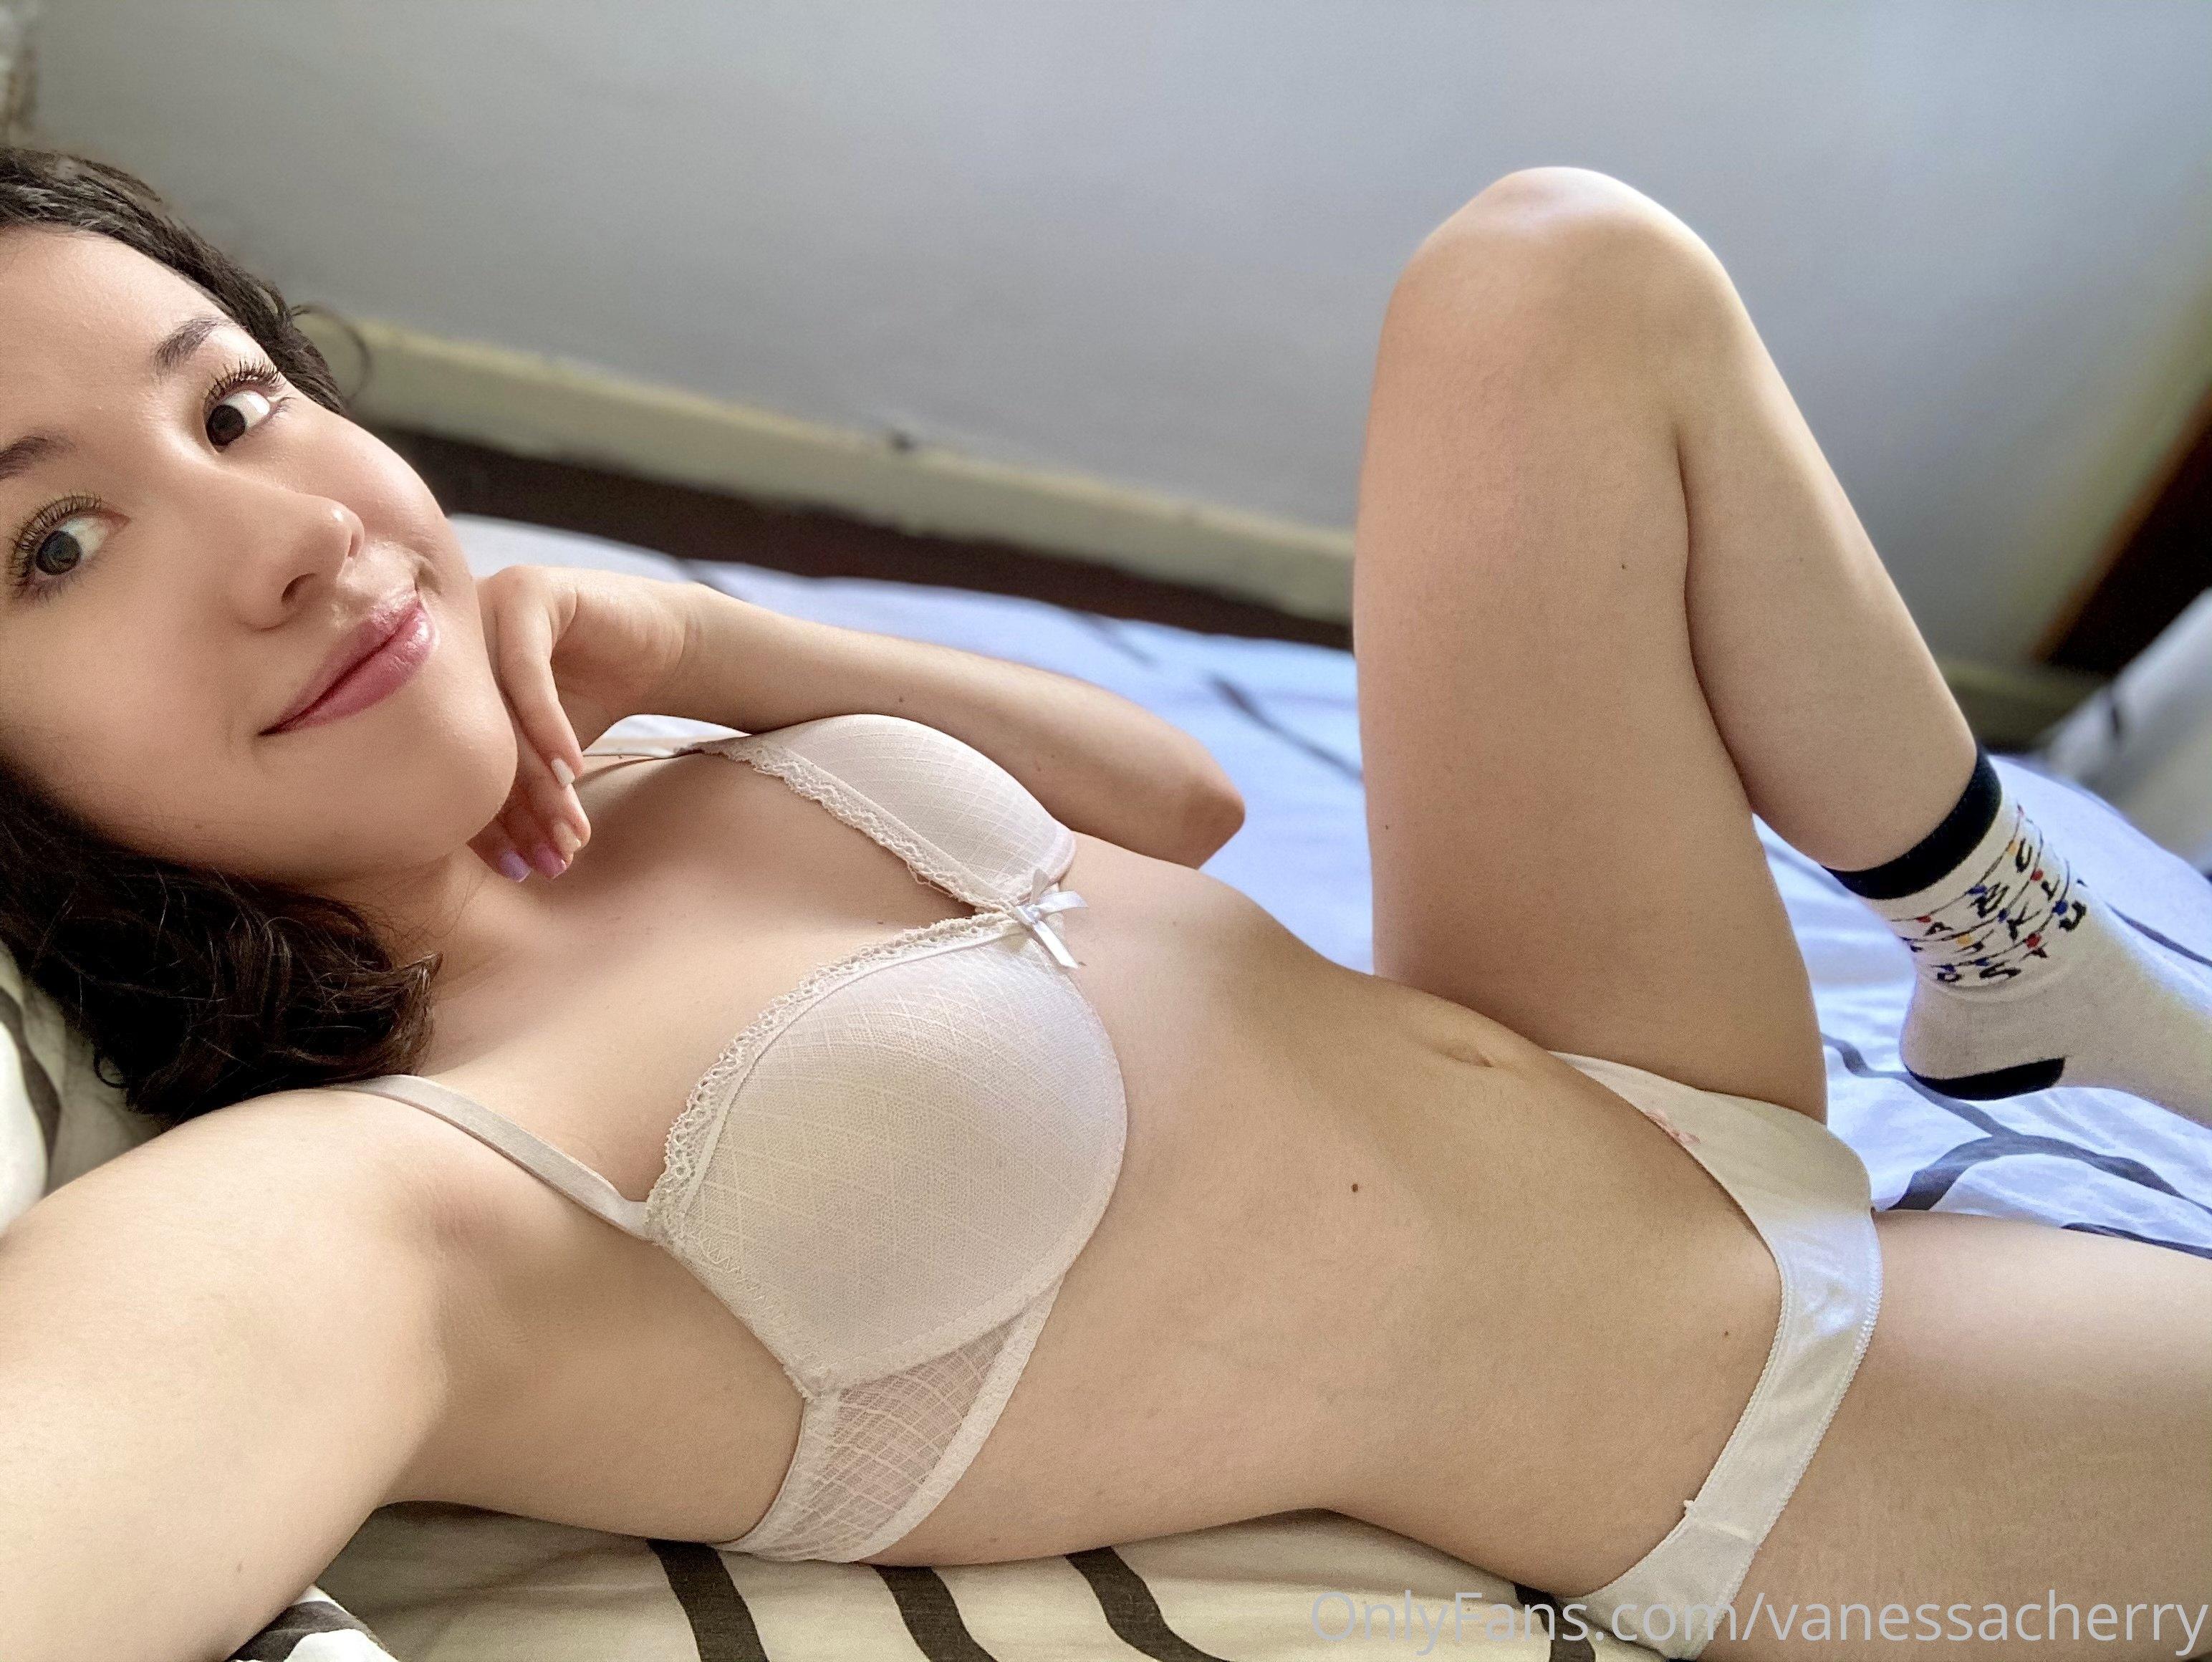 Vanessacherry 0310